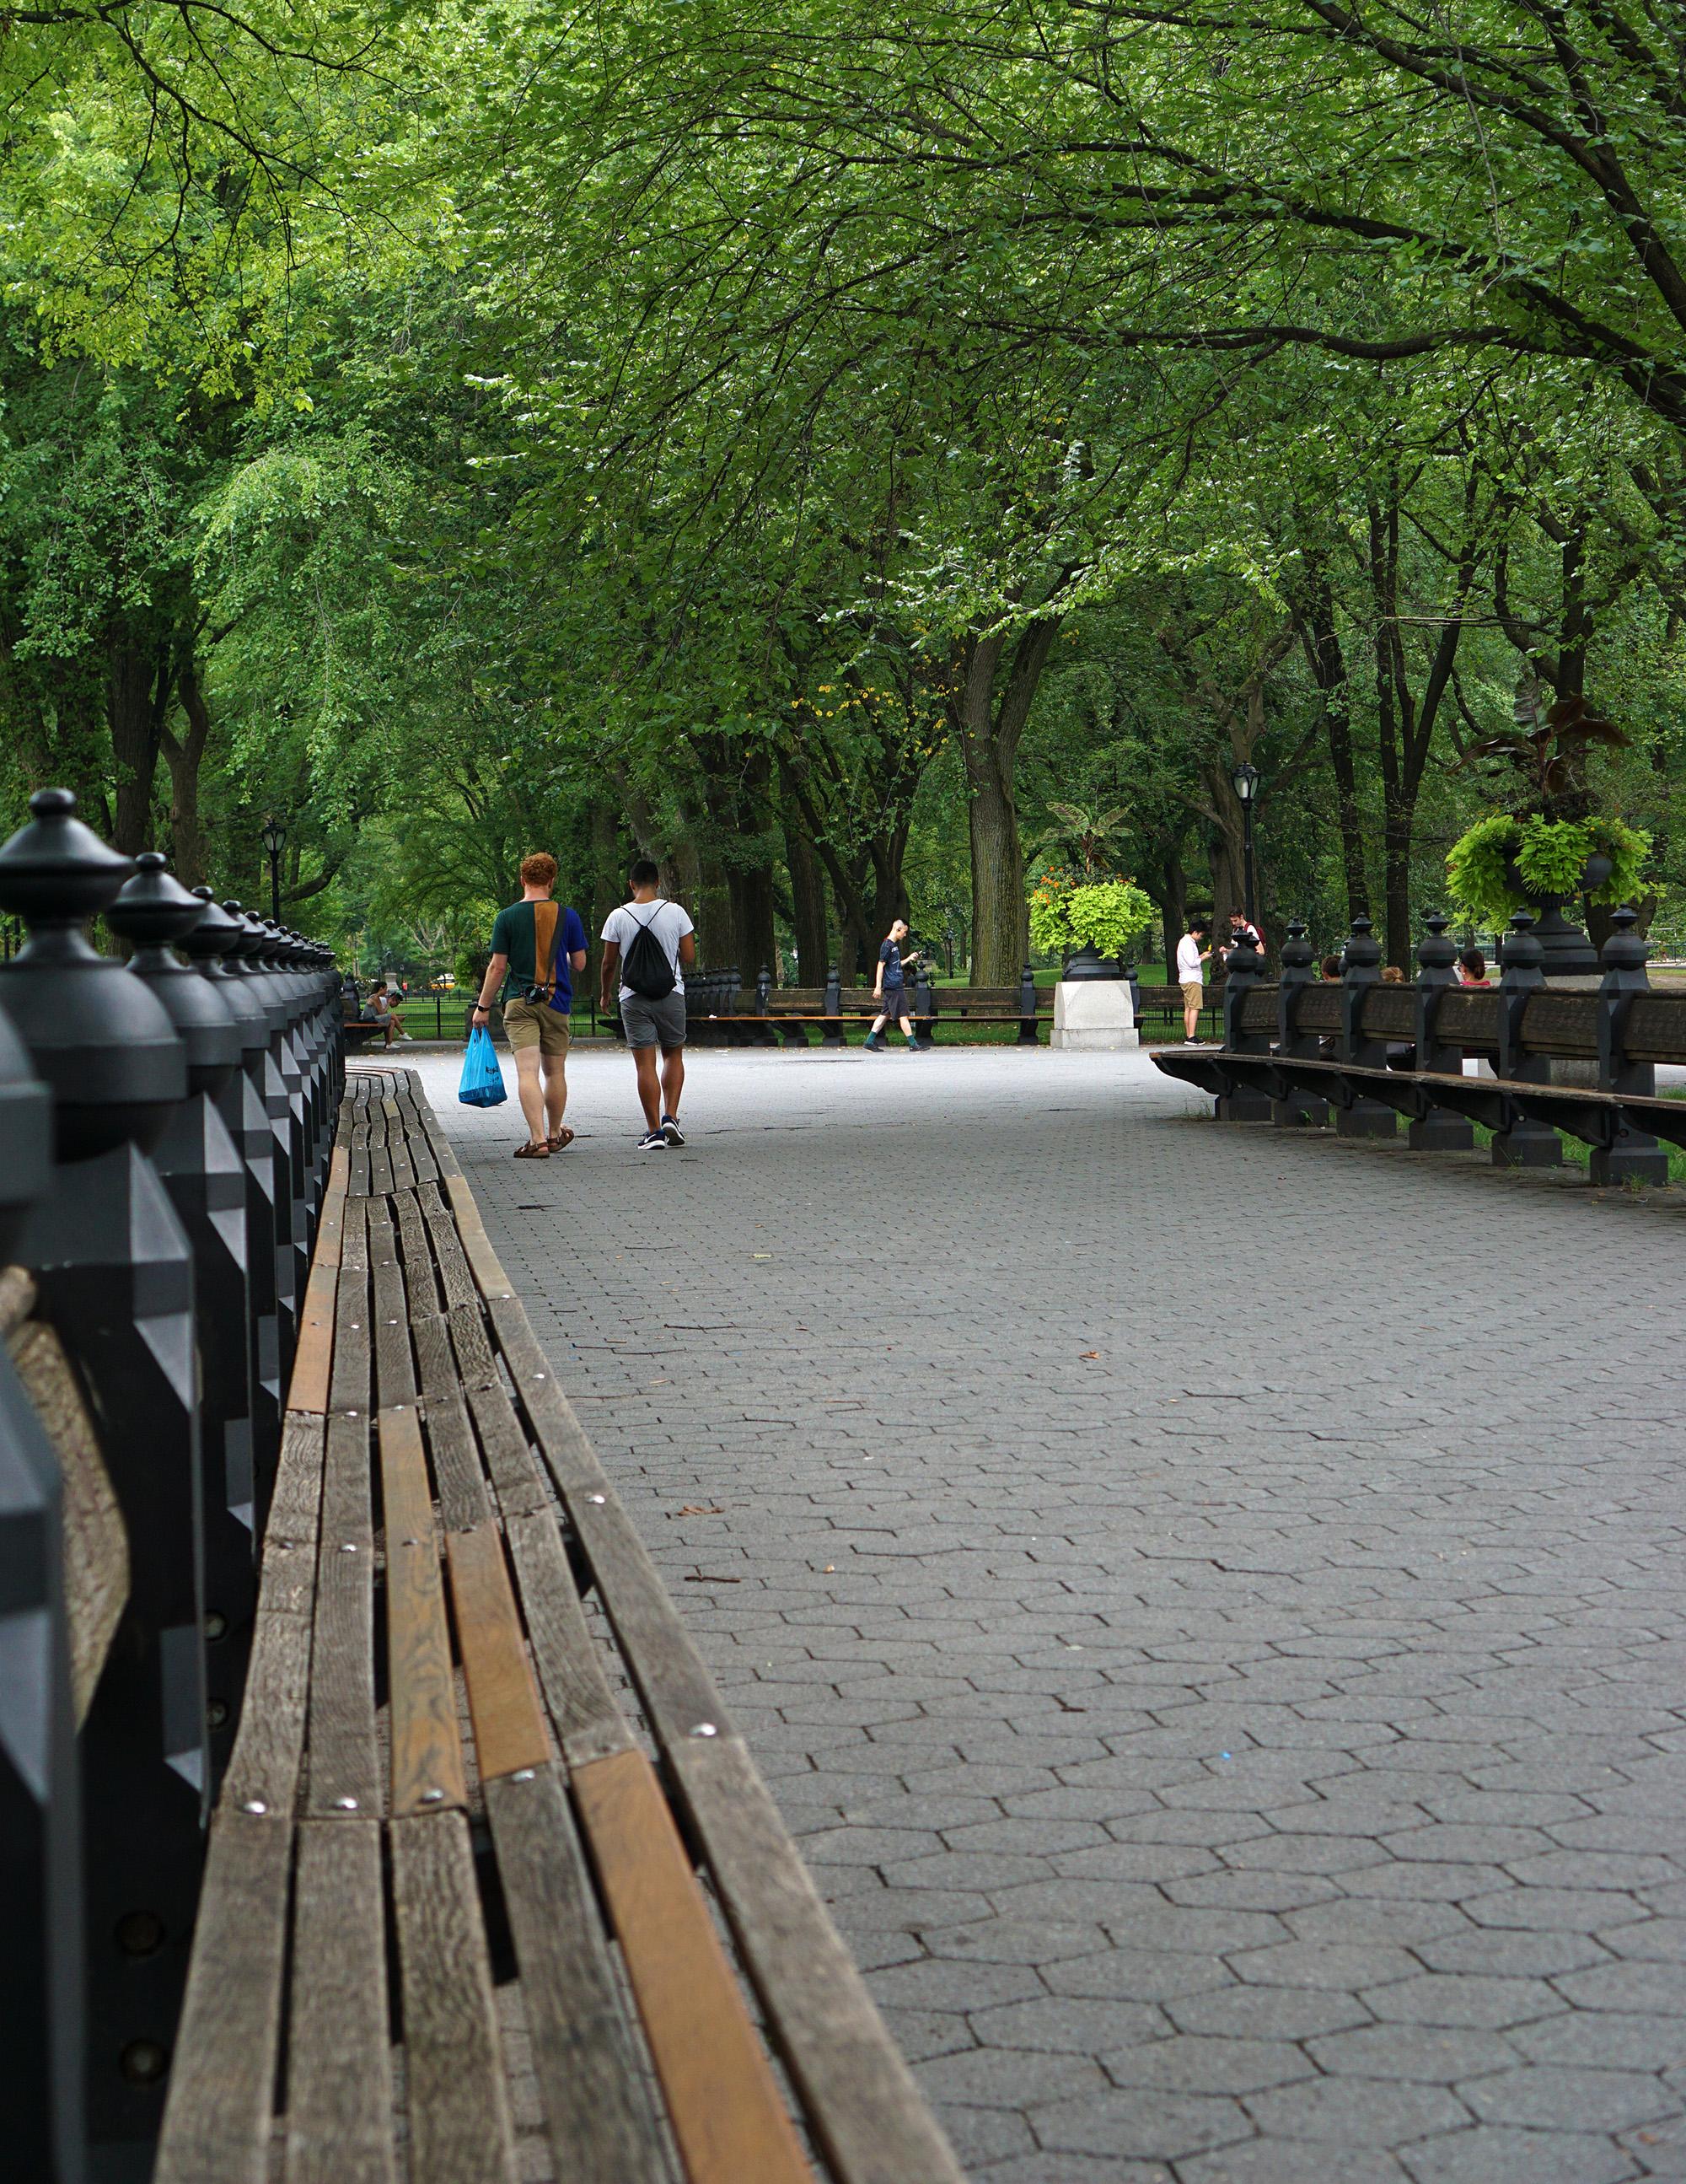 Central Park, New York City / Darker than Green